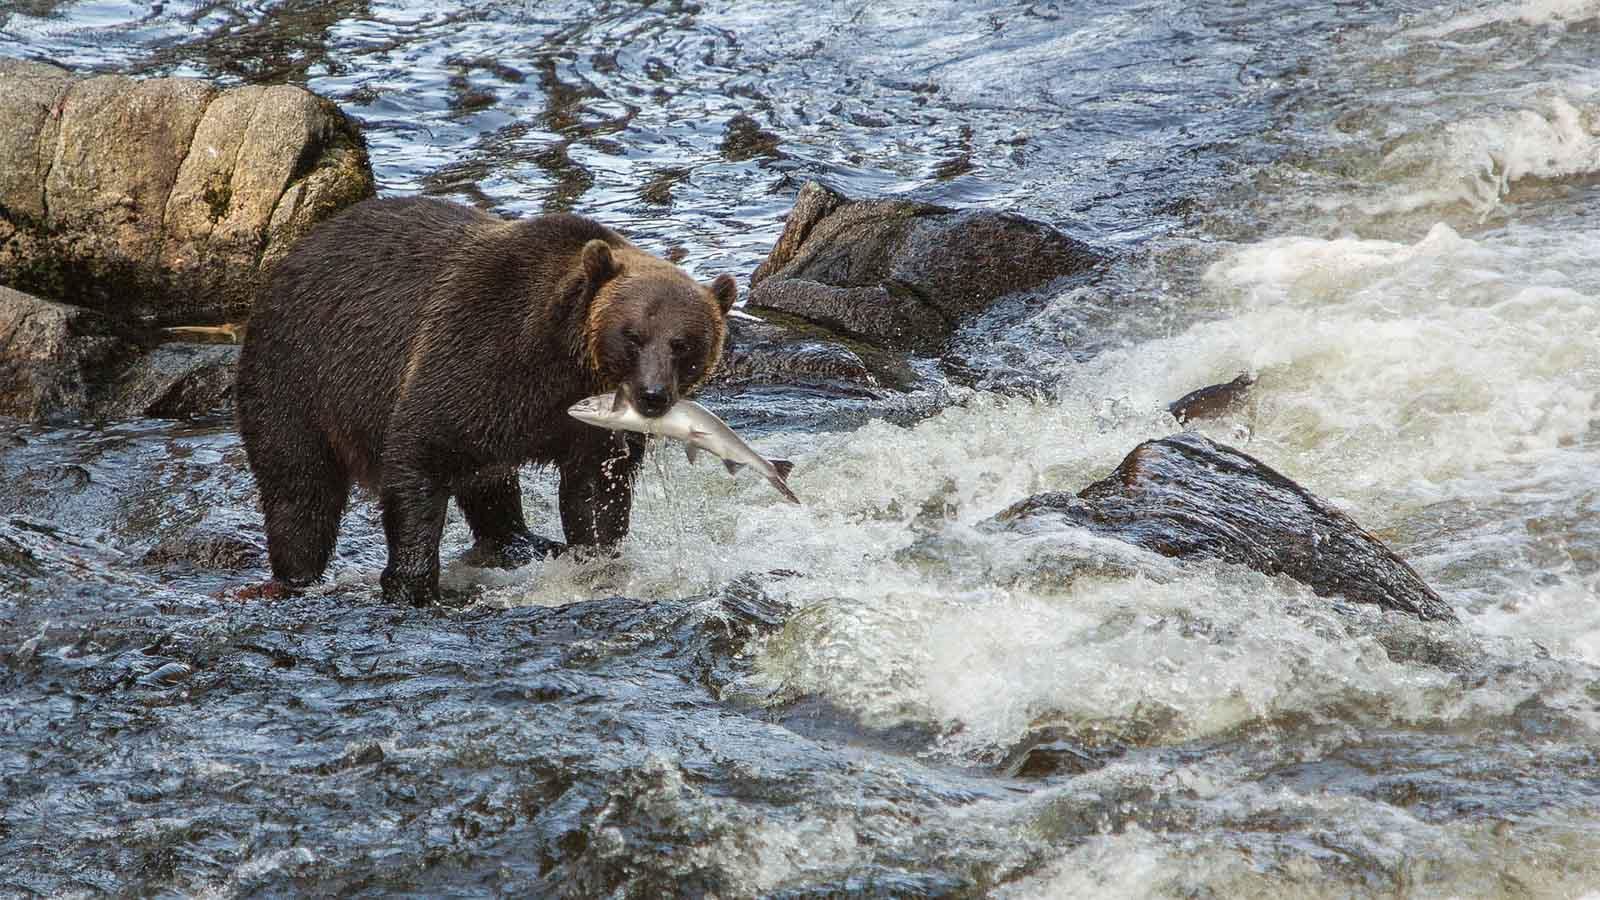 Auf den Spuren des Yukons - Tessin River - Bär